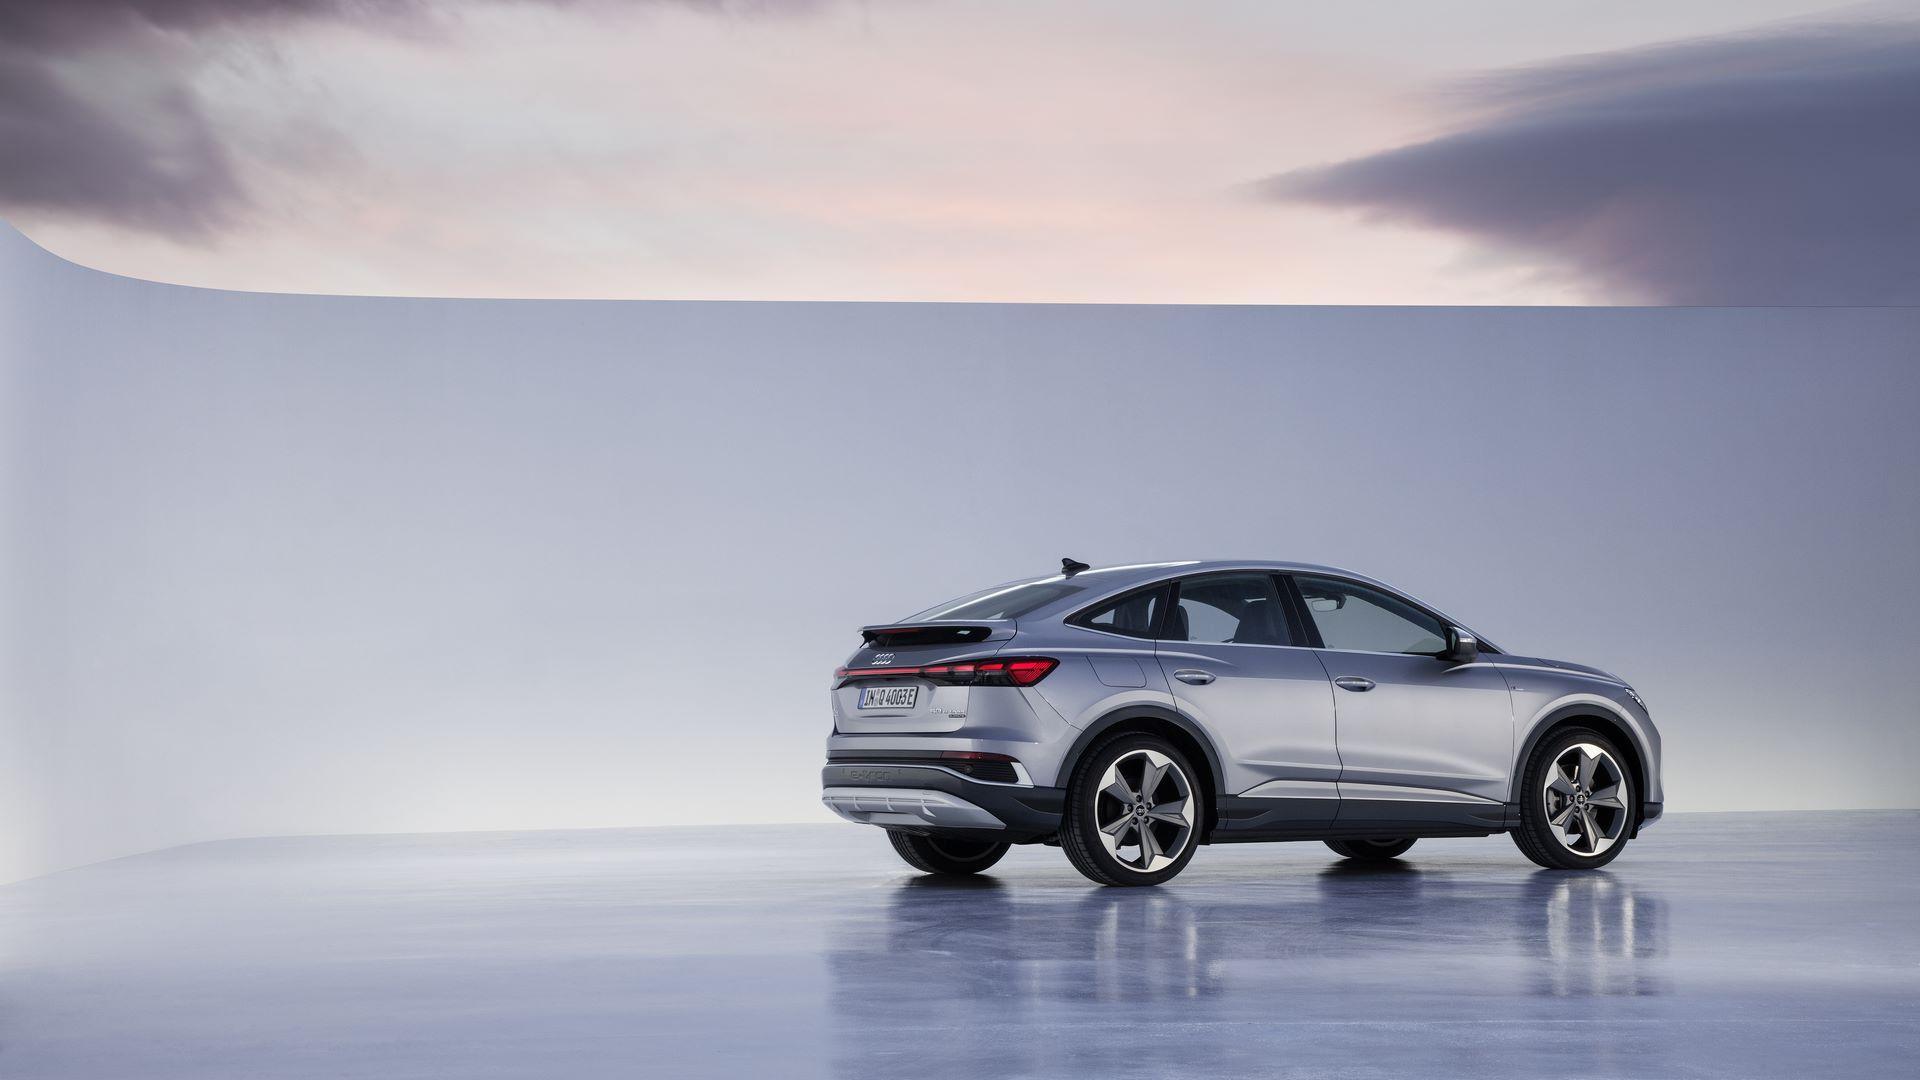 Audi-Q4-e-tron-and-Q4-e-tron-Sportback-36